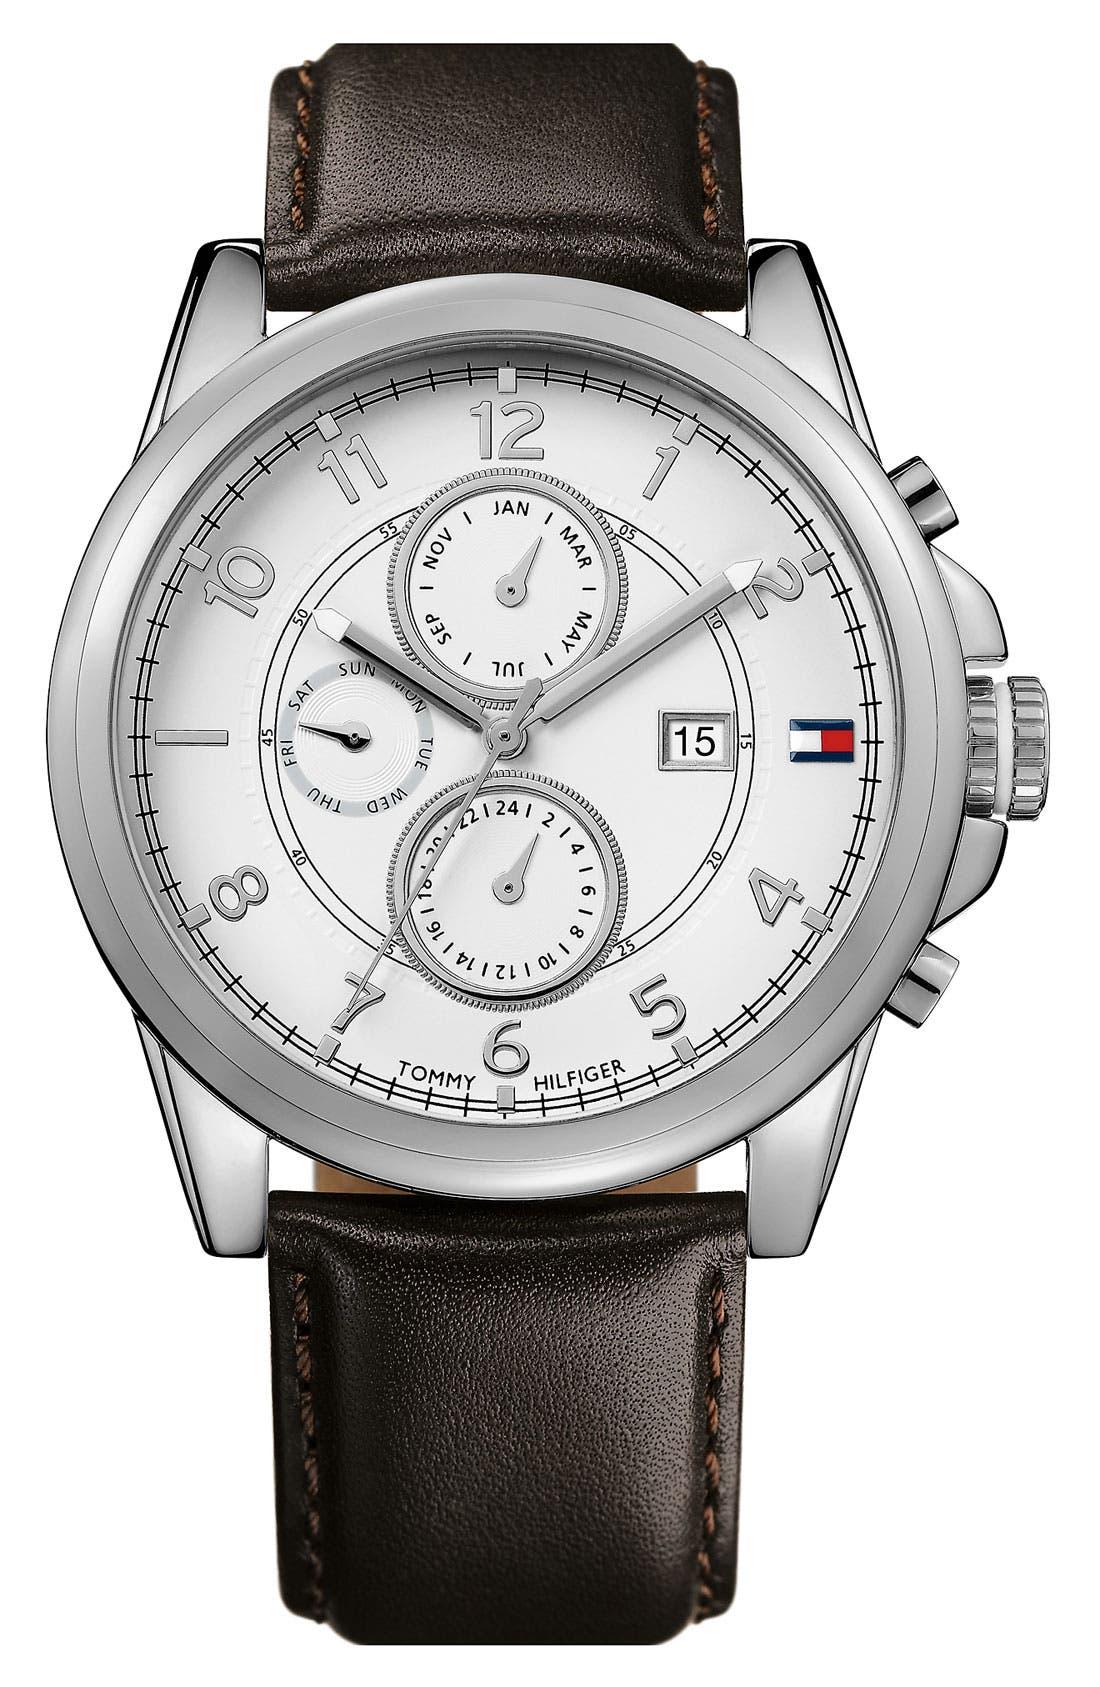 Main Image - Tommy Hilfiger Multi Eye Leather Strap Watch, 46mm